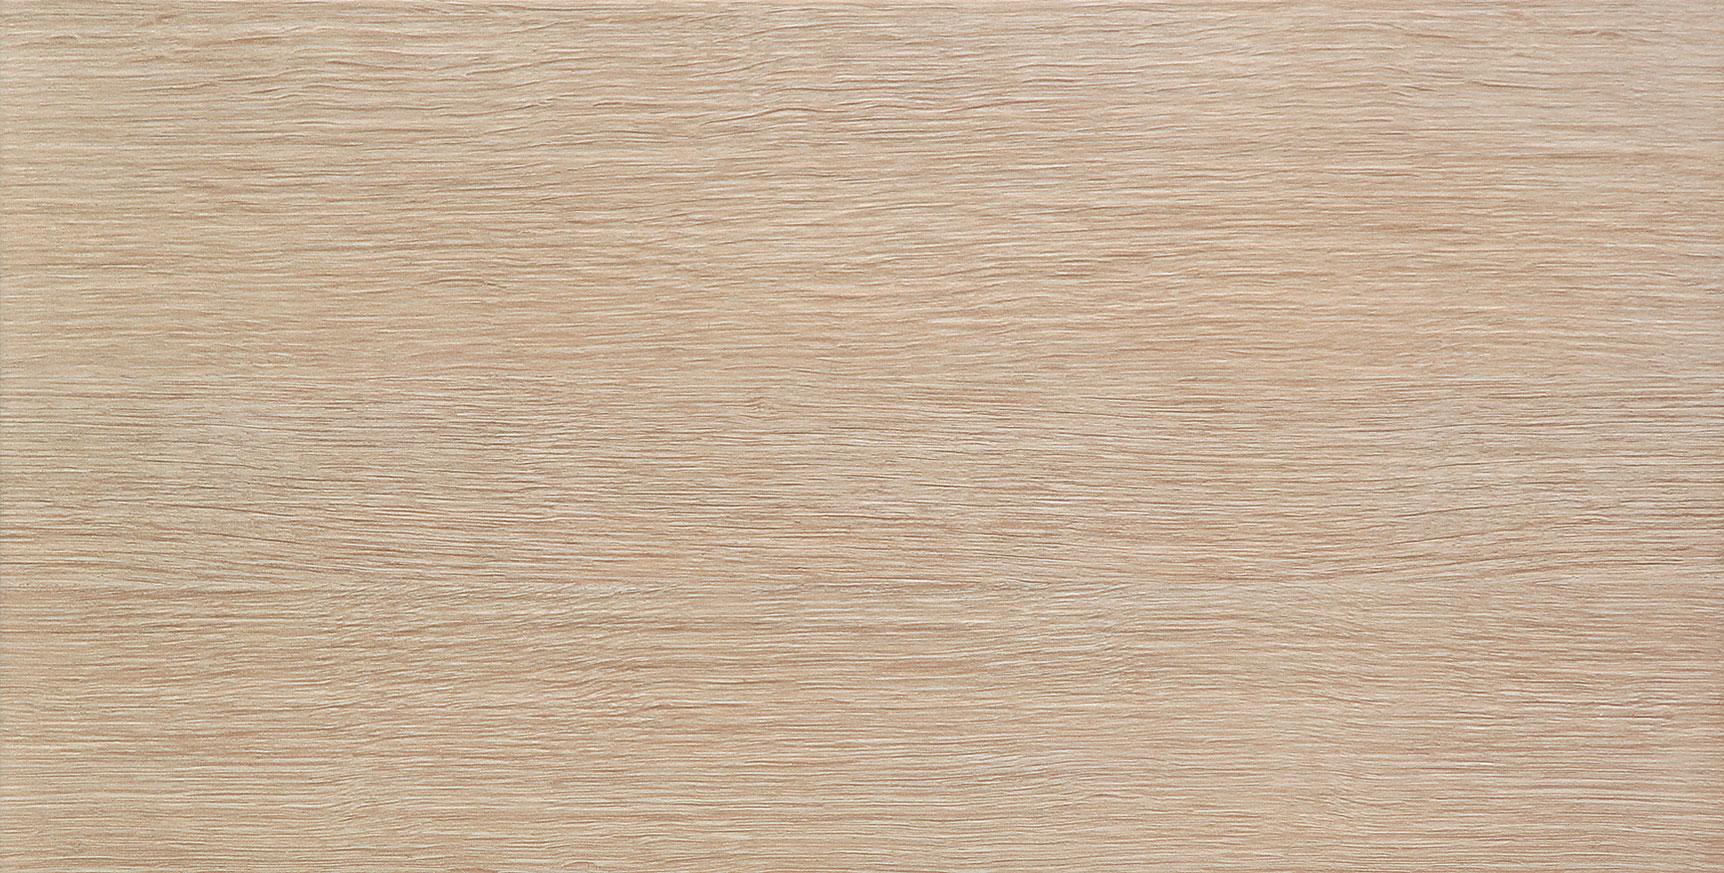 Tubadzin BILOBA Beige 60,8×30,8